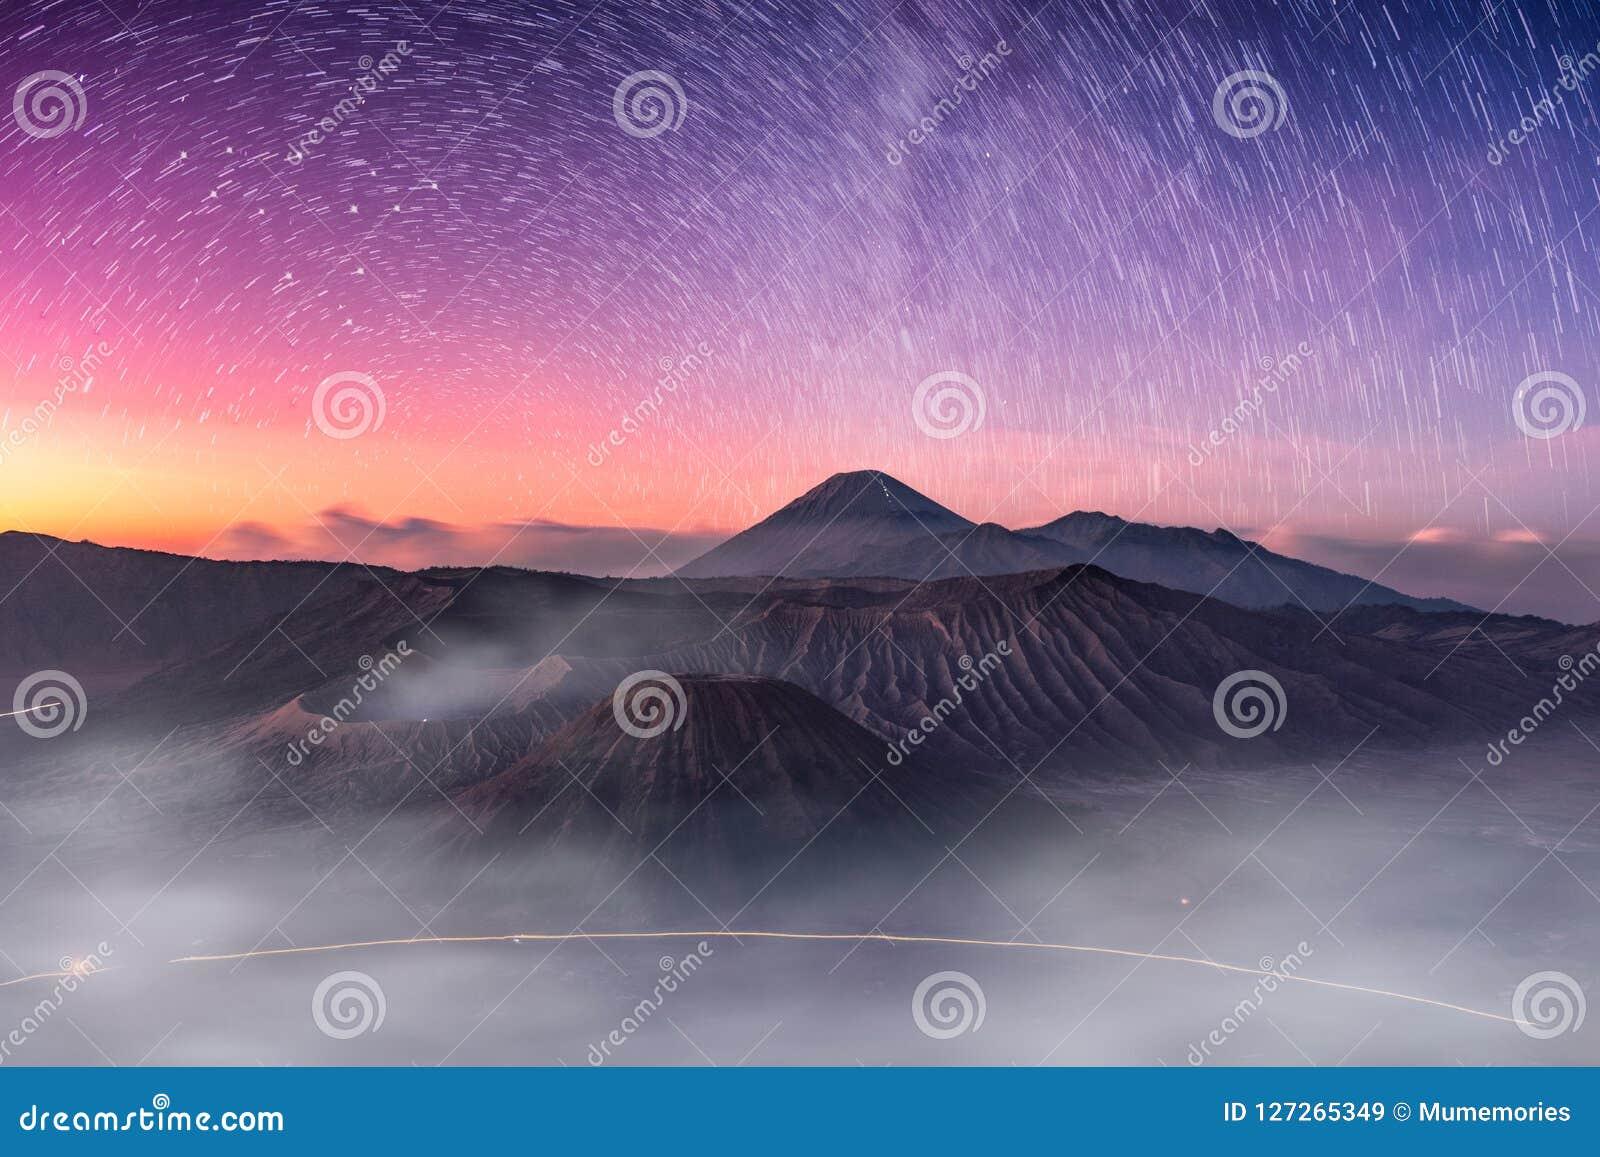 Mount active volcano, Batok, Bromo, Semeru with starry and fog a